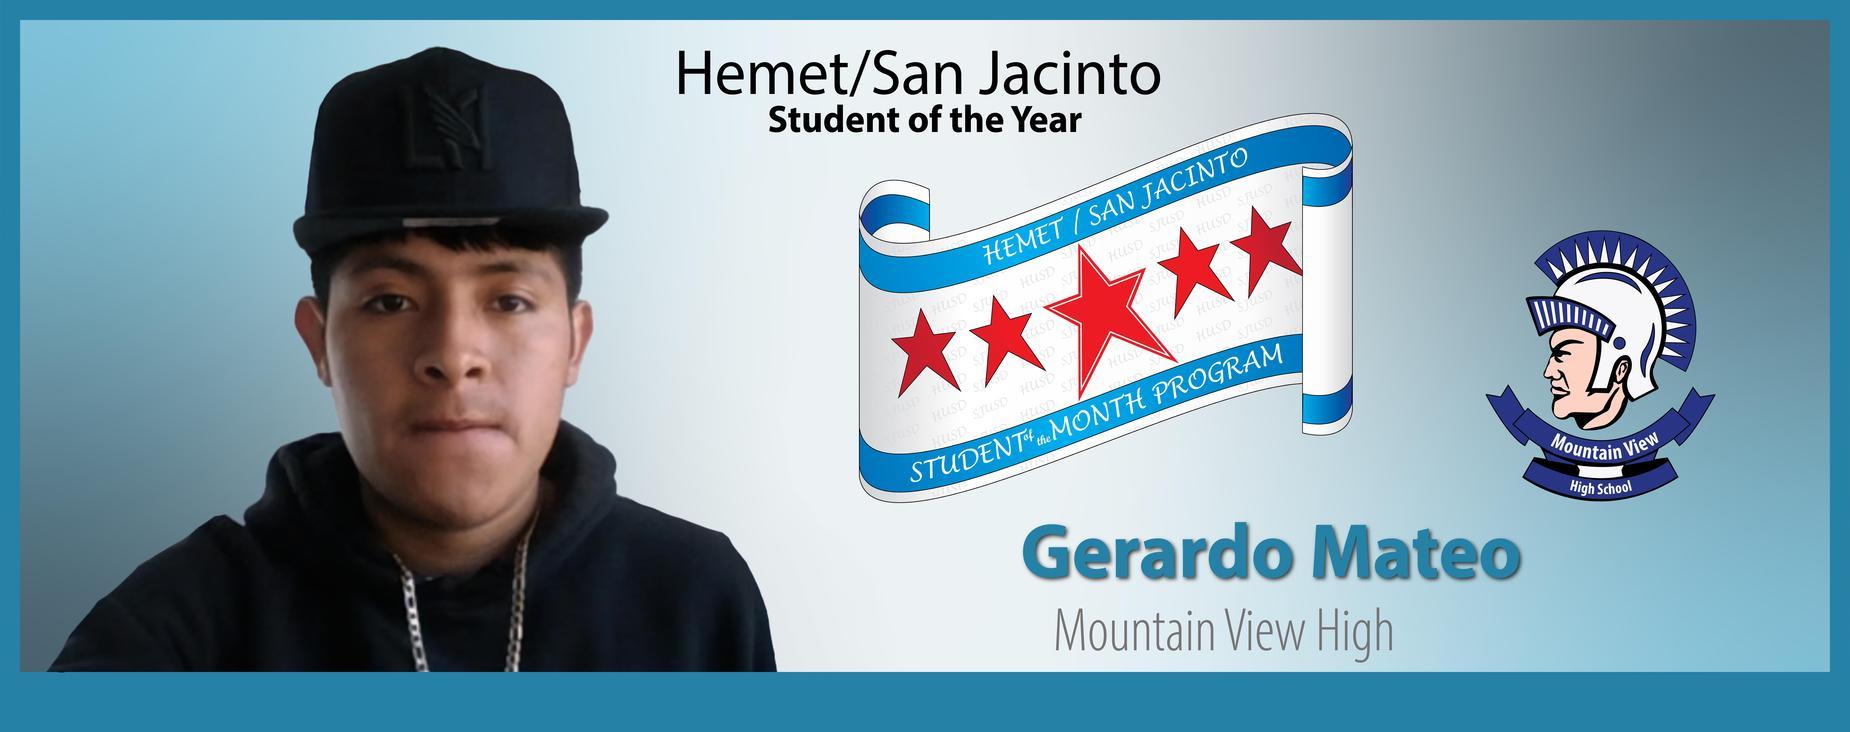 Gerardo Mateo Student of the Year